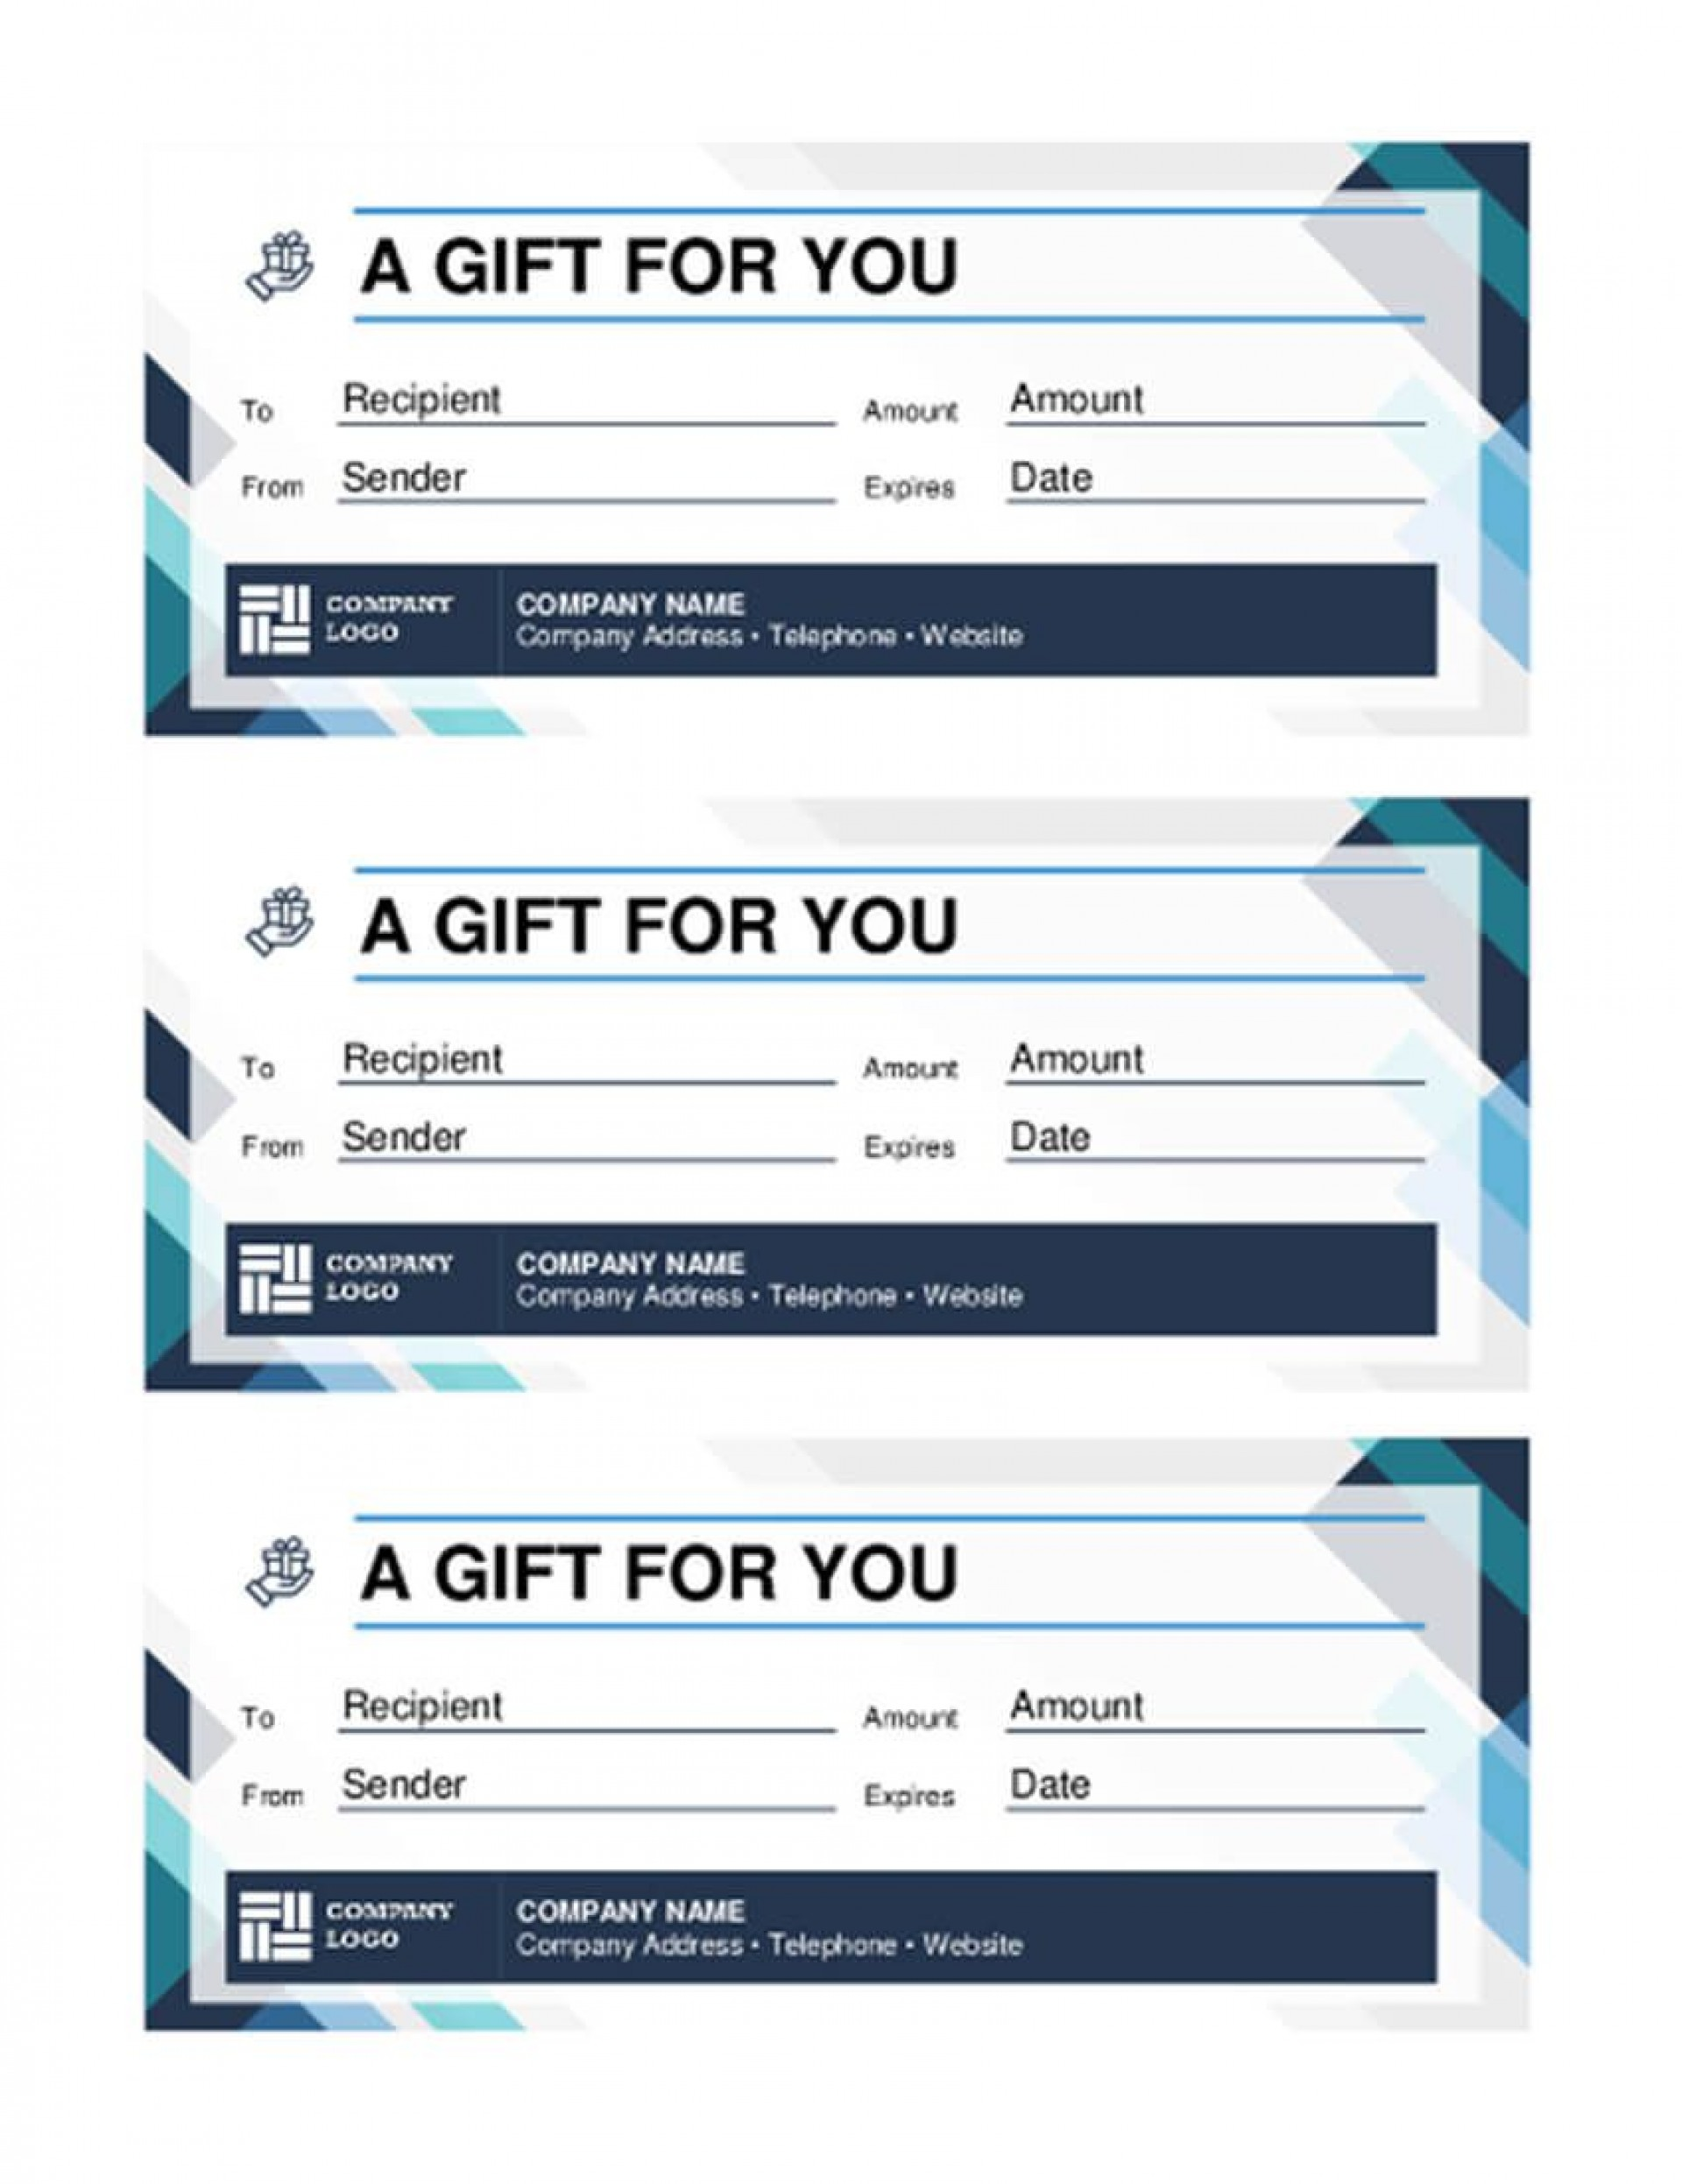 001 Unique Restaurant Gift Certificate Template Design  Templates Card Word Voucher Free1920